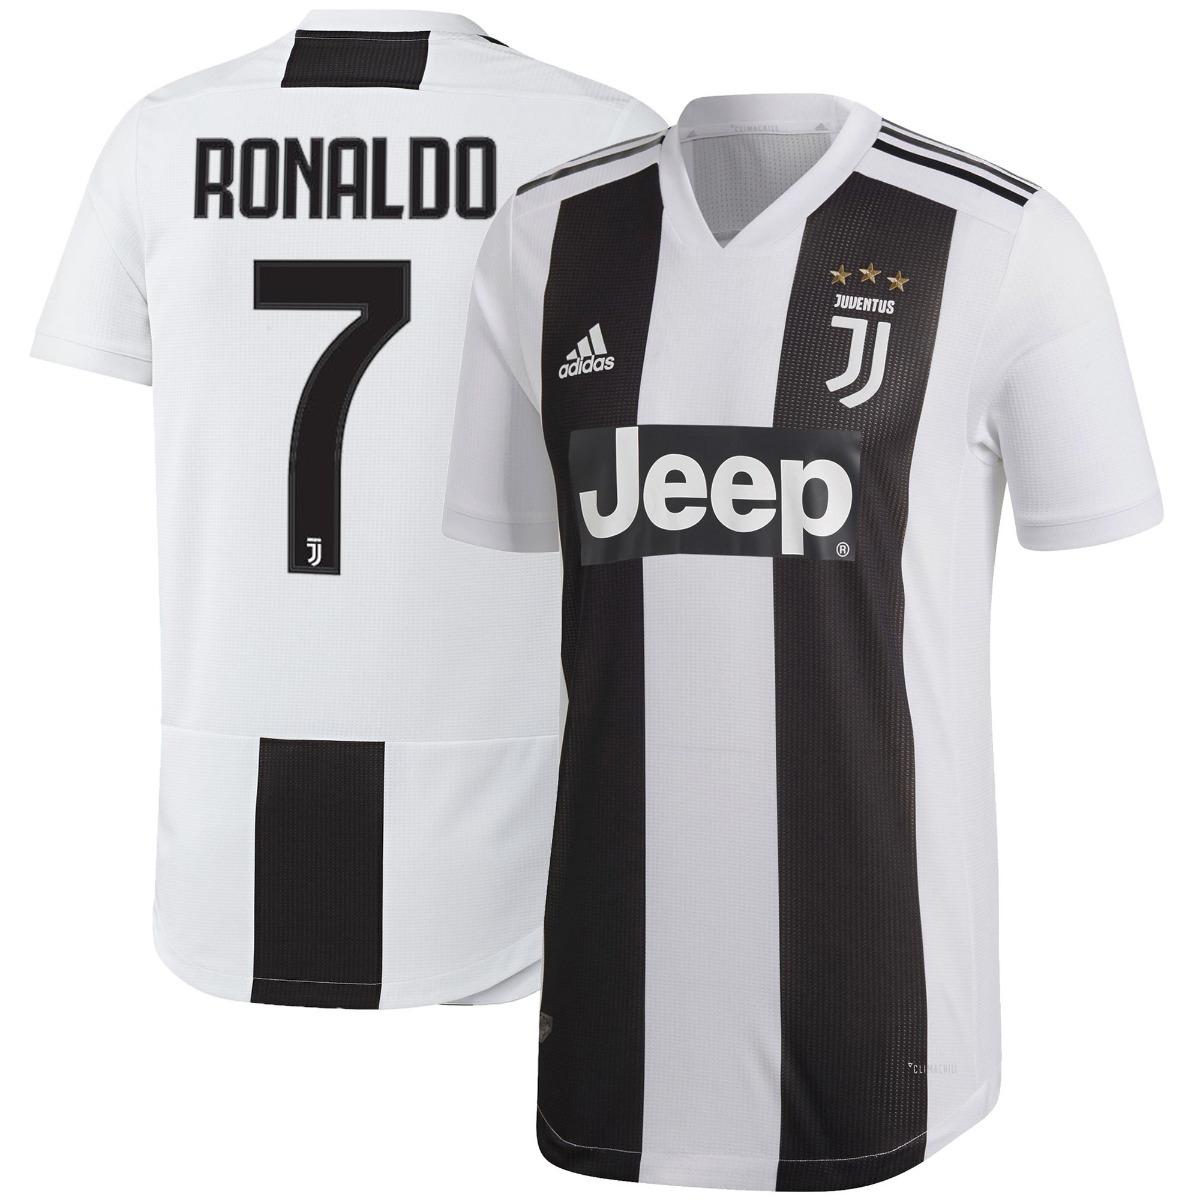 camiseta juventus titular 2018-2019 ronaldo  7 climachill. Cargando zoom. be2f1782bf96c